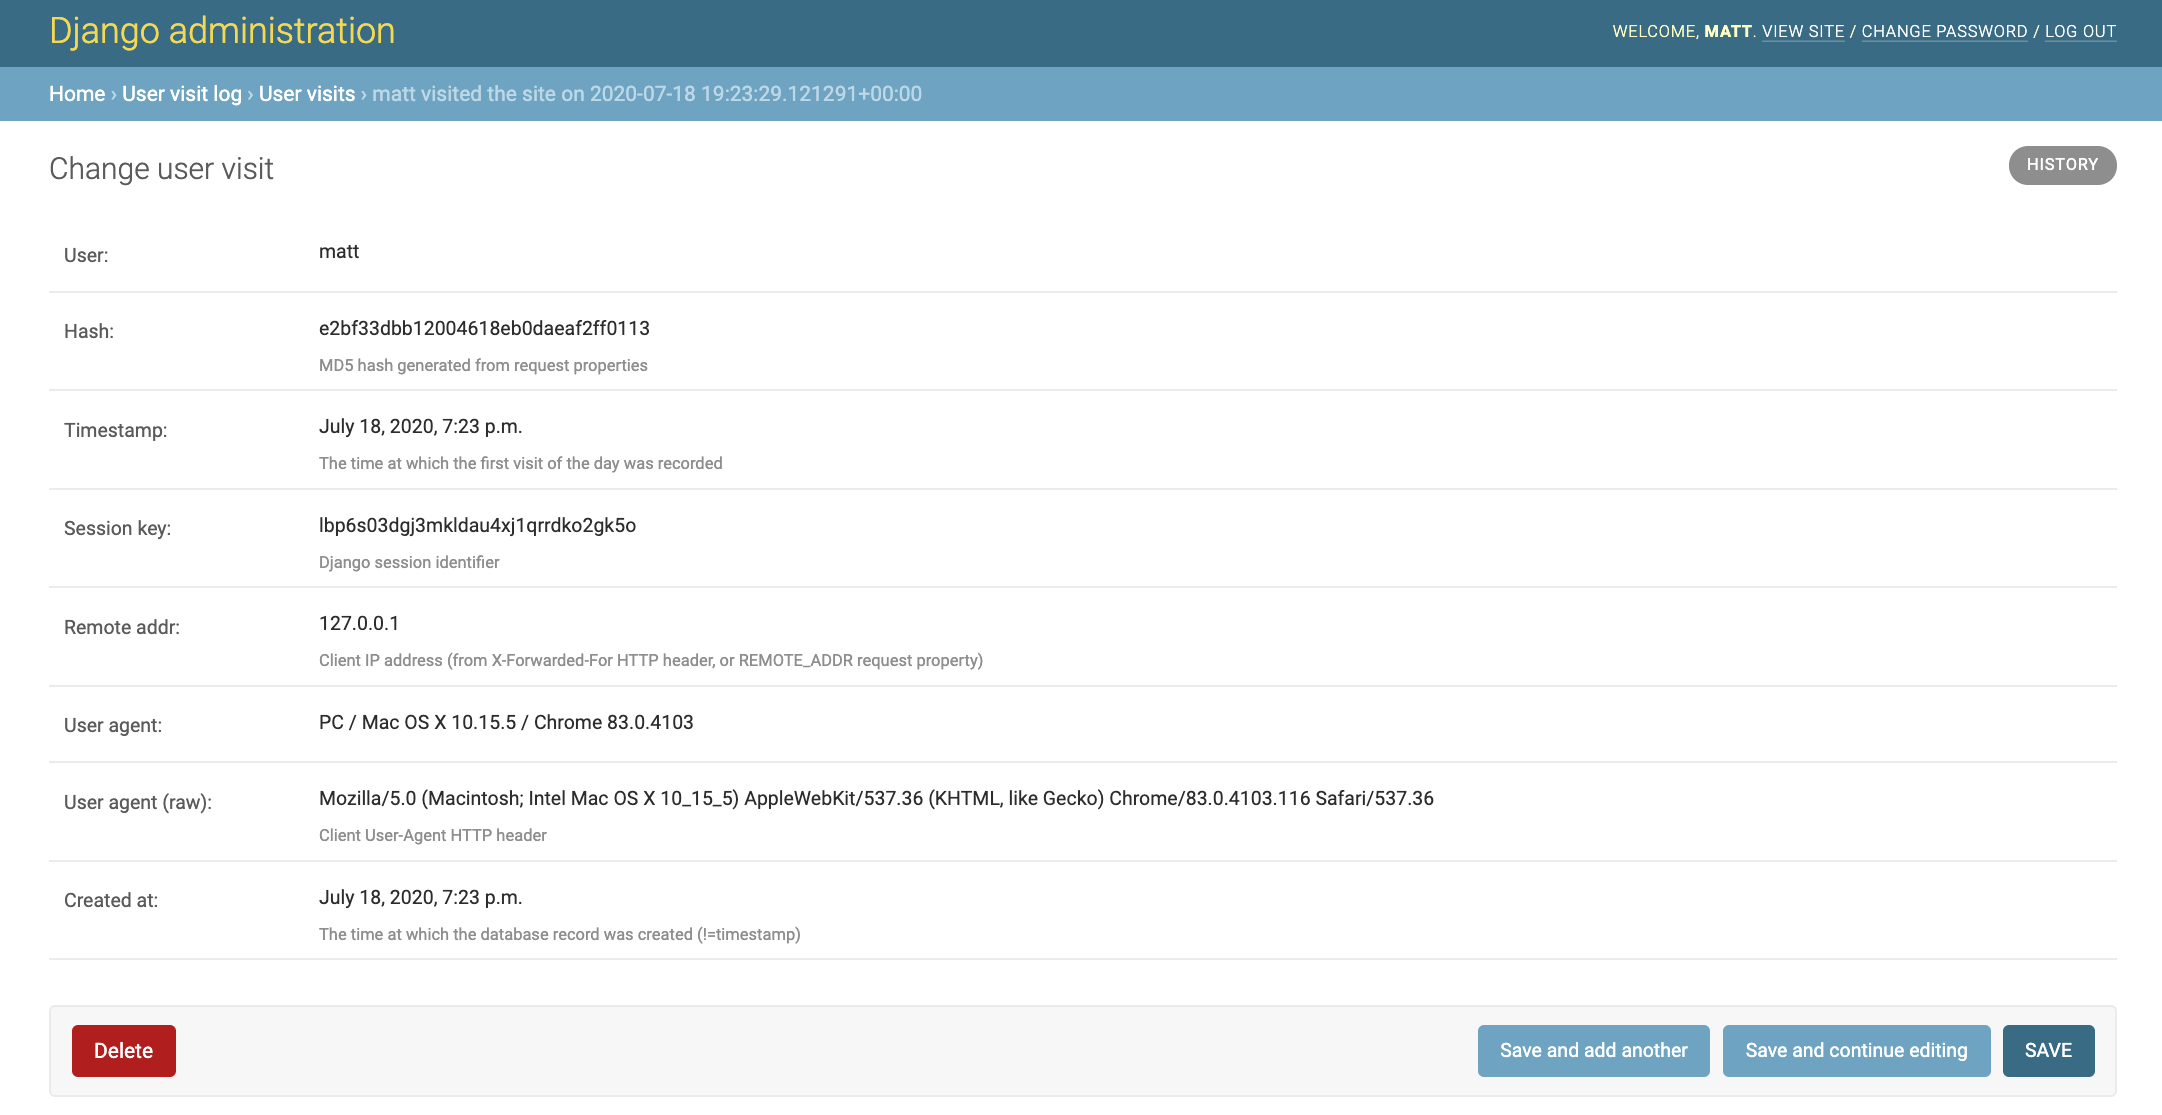 Django Admin with django-user-visit information